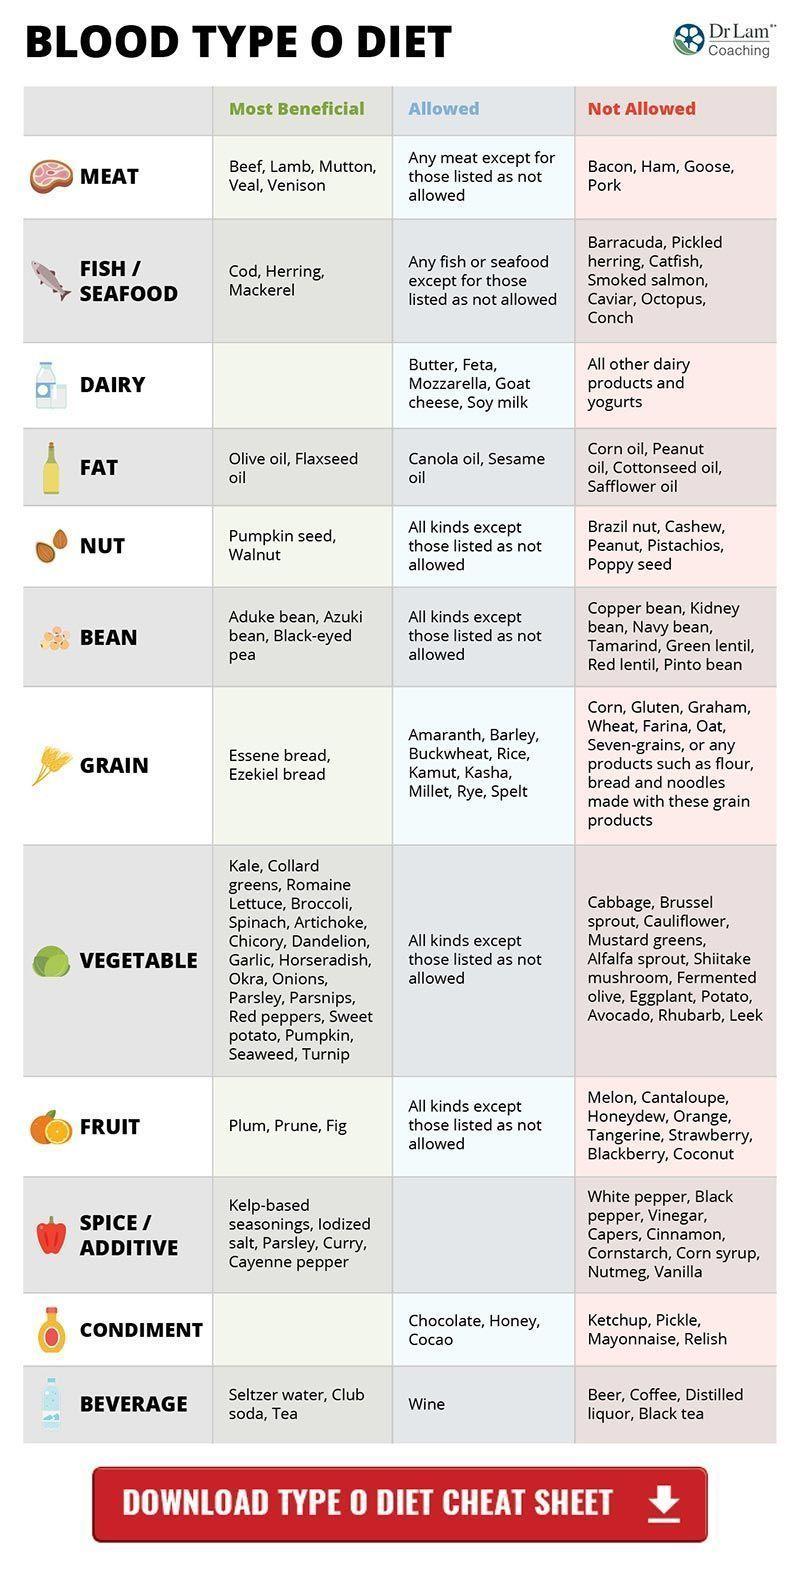 Blood type diet chart type o bloodtypediet bloodsugar insulin